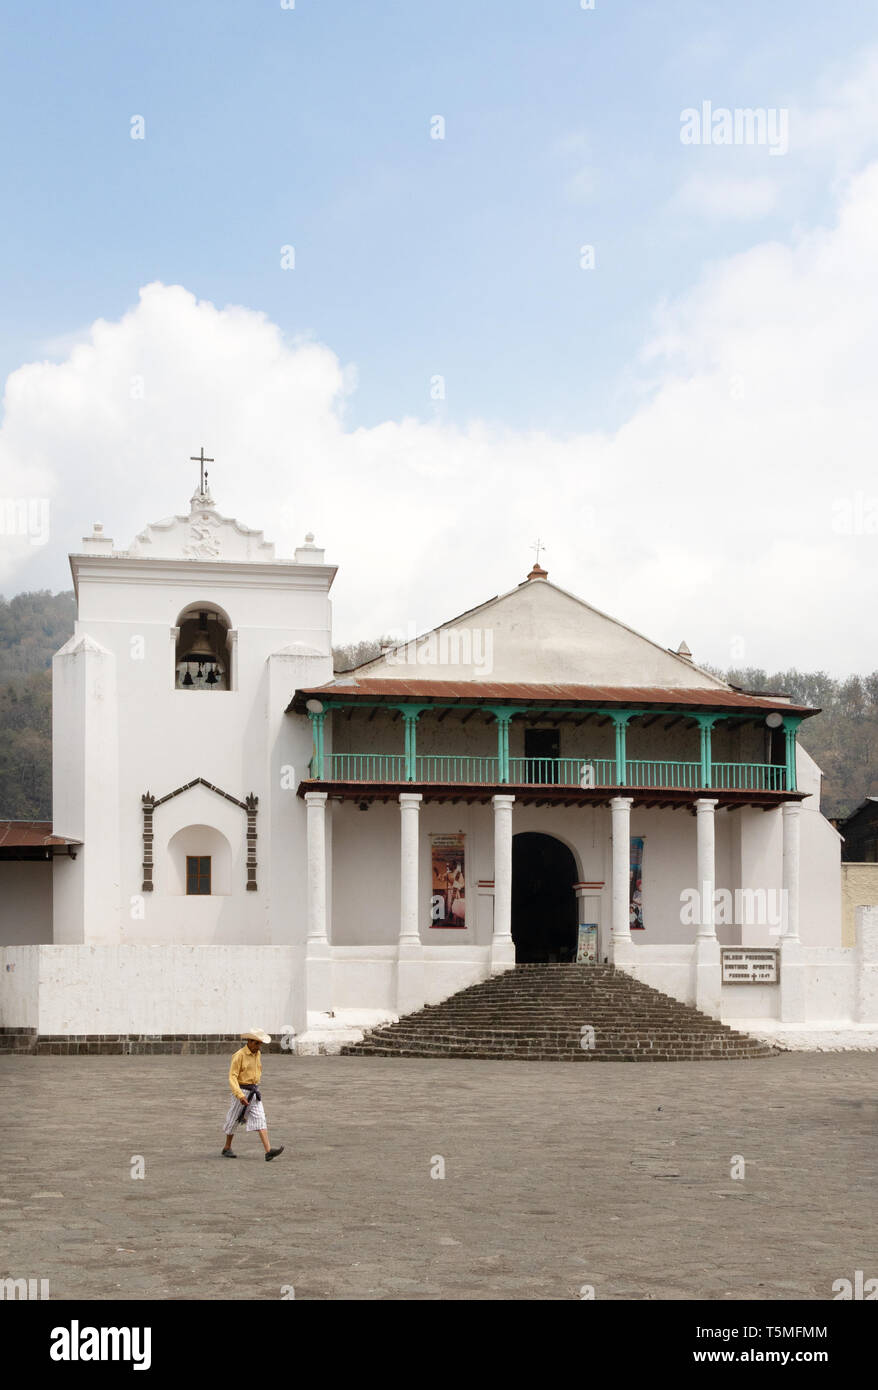 St James the Apostle church, Santiago Atitlan, Guatemala, Central America - Stock Image